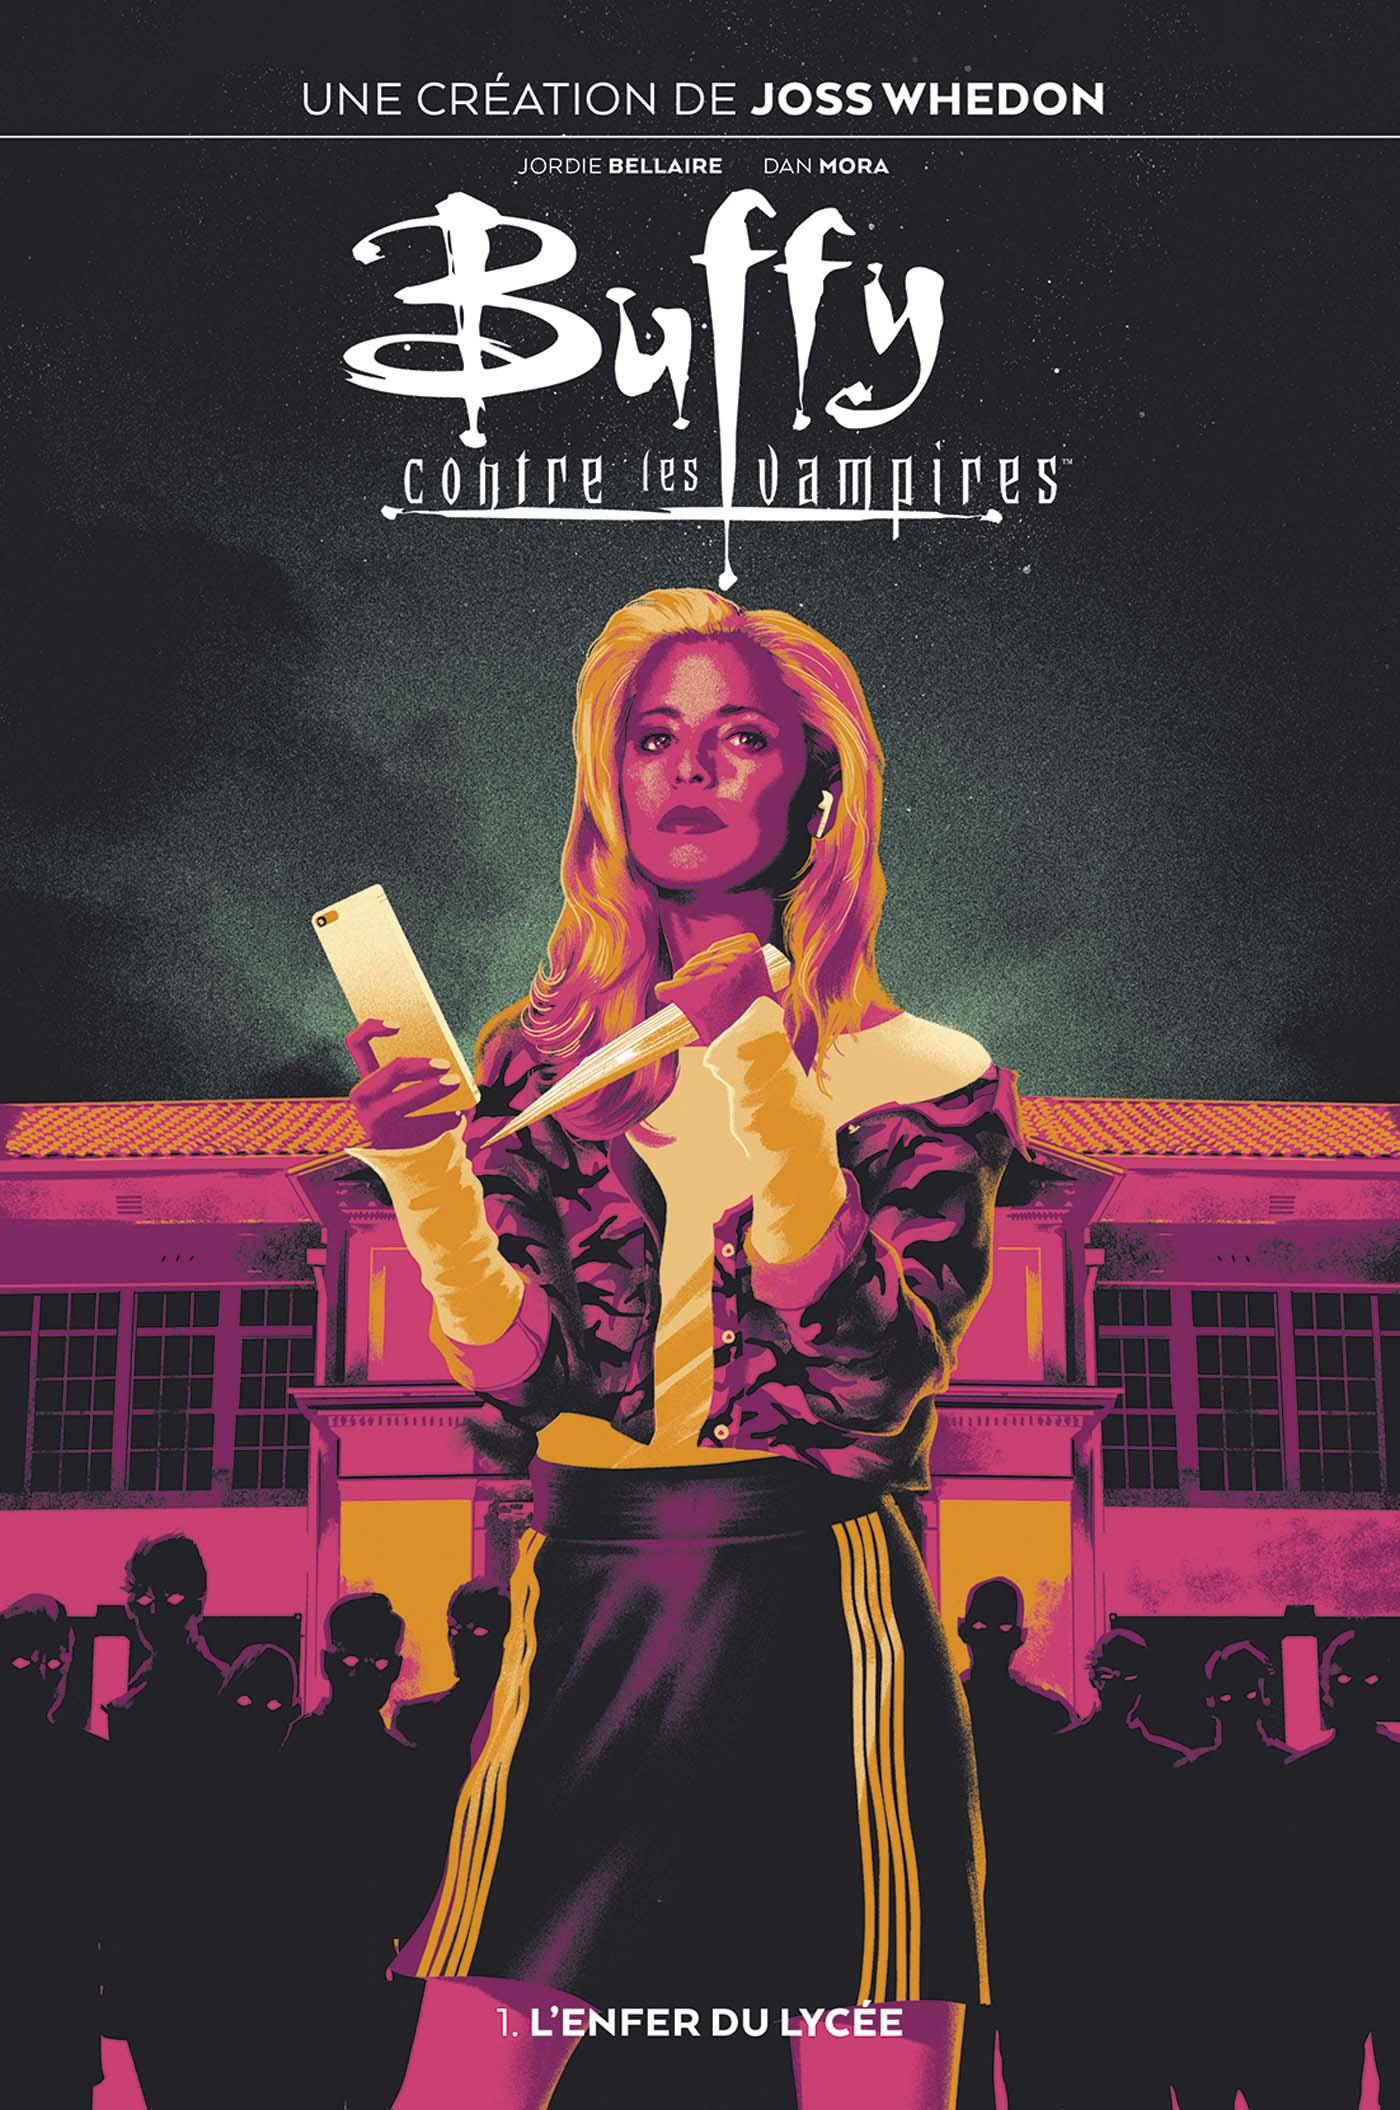 Buffy Contre les Vampires [20th Television - 202?] Img_comics_14971_buffy-contre-les-vampires-1